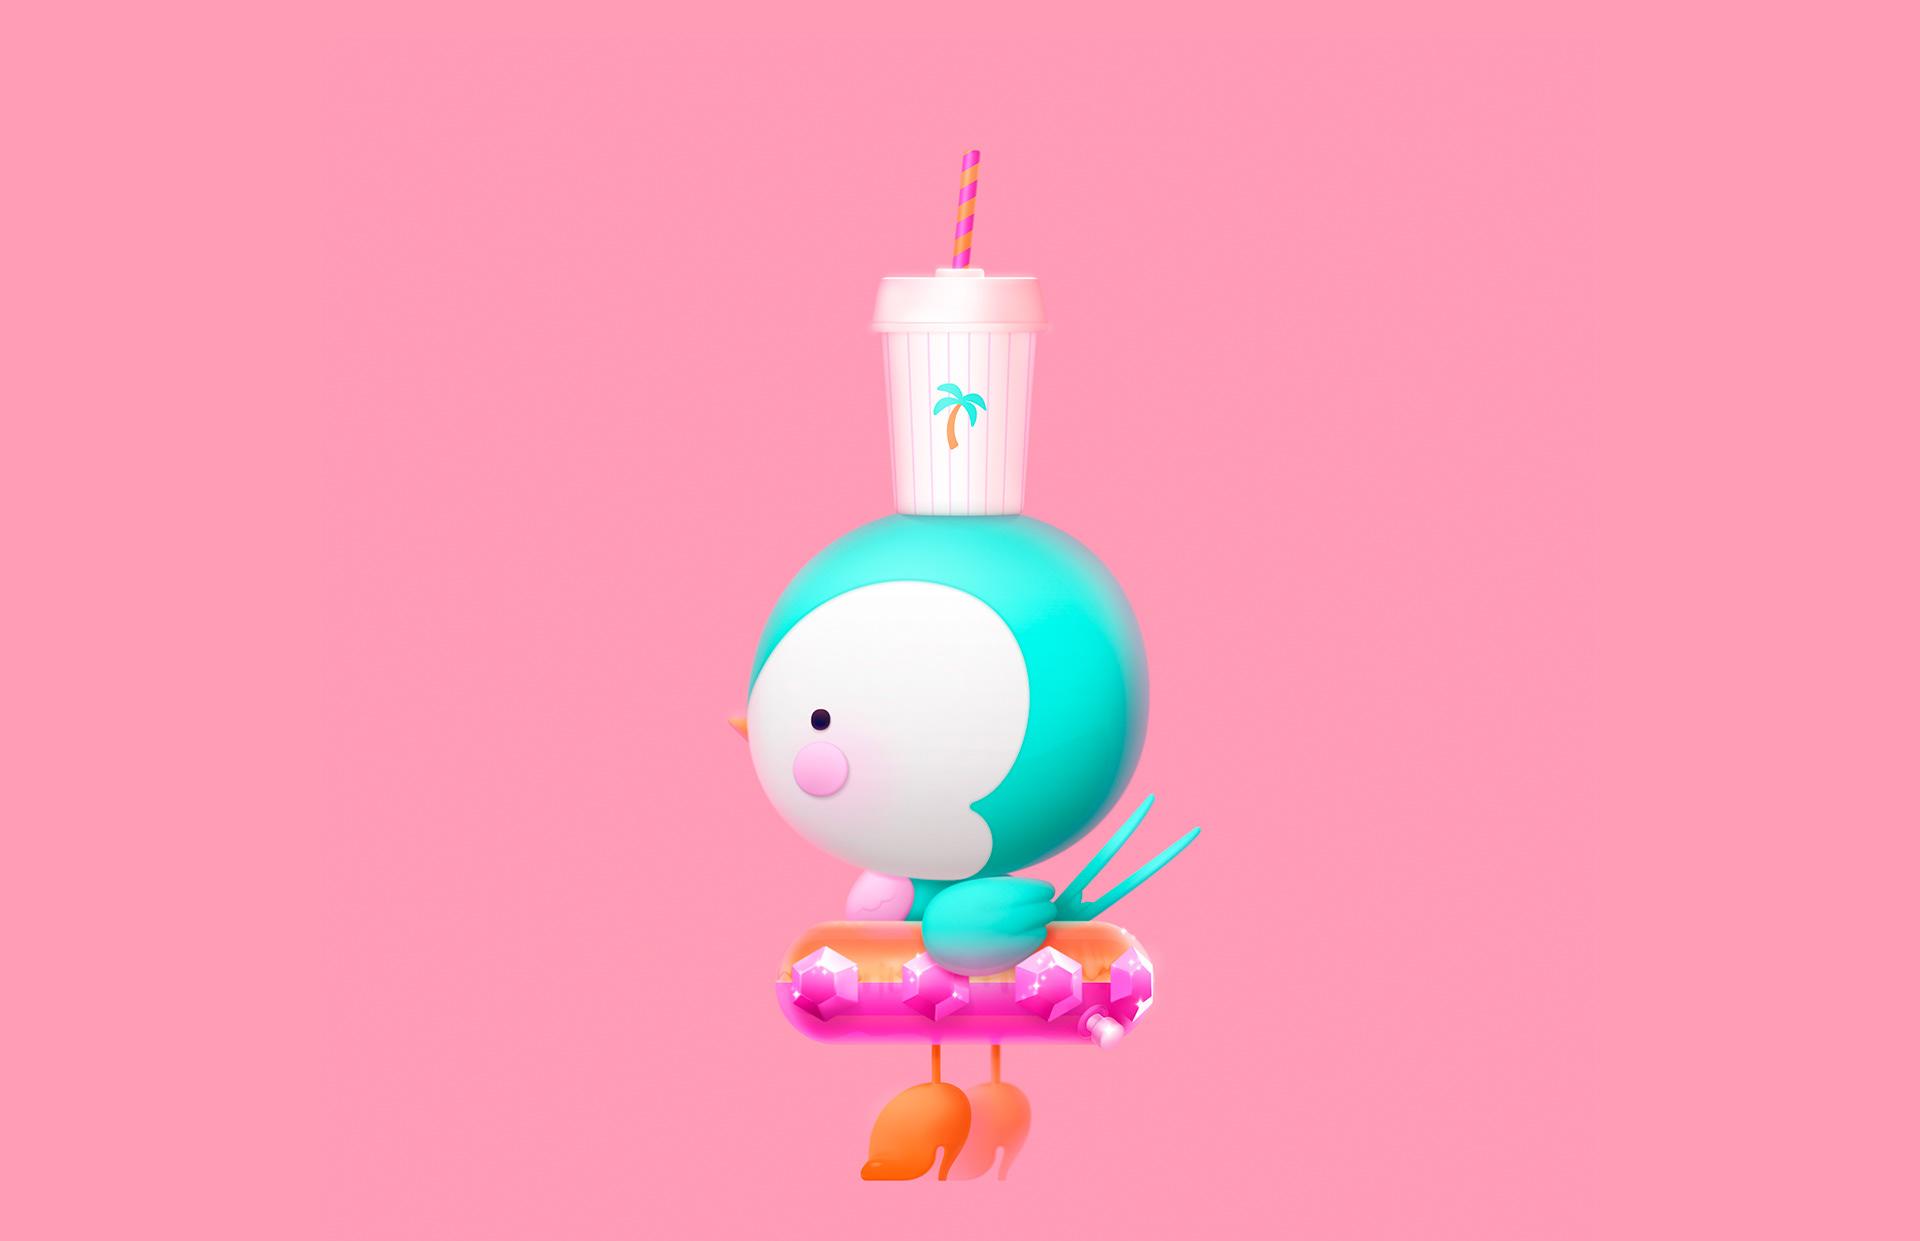 Character Design,Digital Art,Illustration